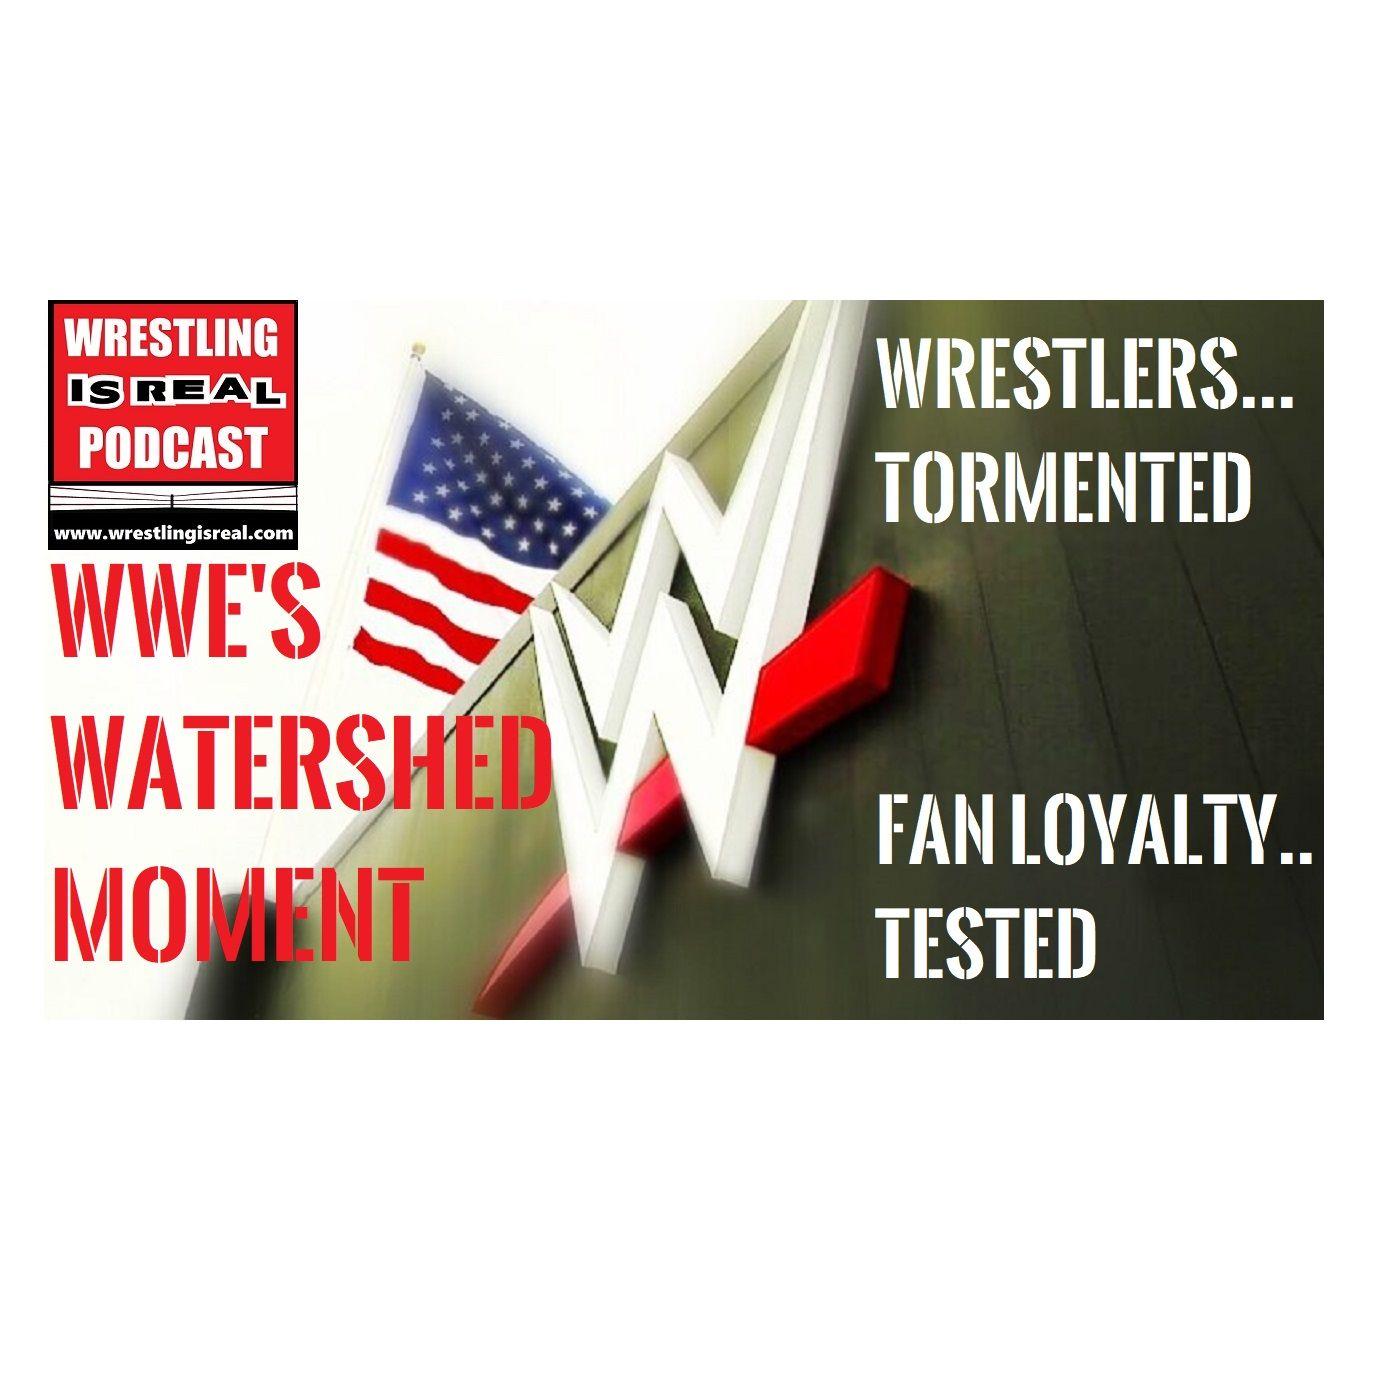 WWE's Watershed Moment | Wrestlers Tormented. Fan Loyalty Tested. KOP041620-528